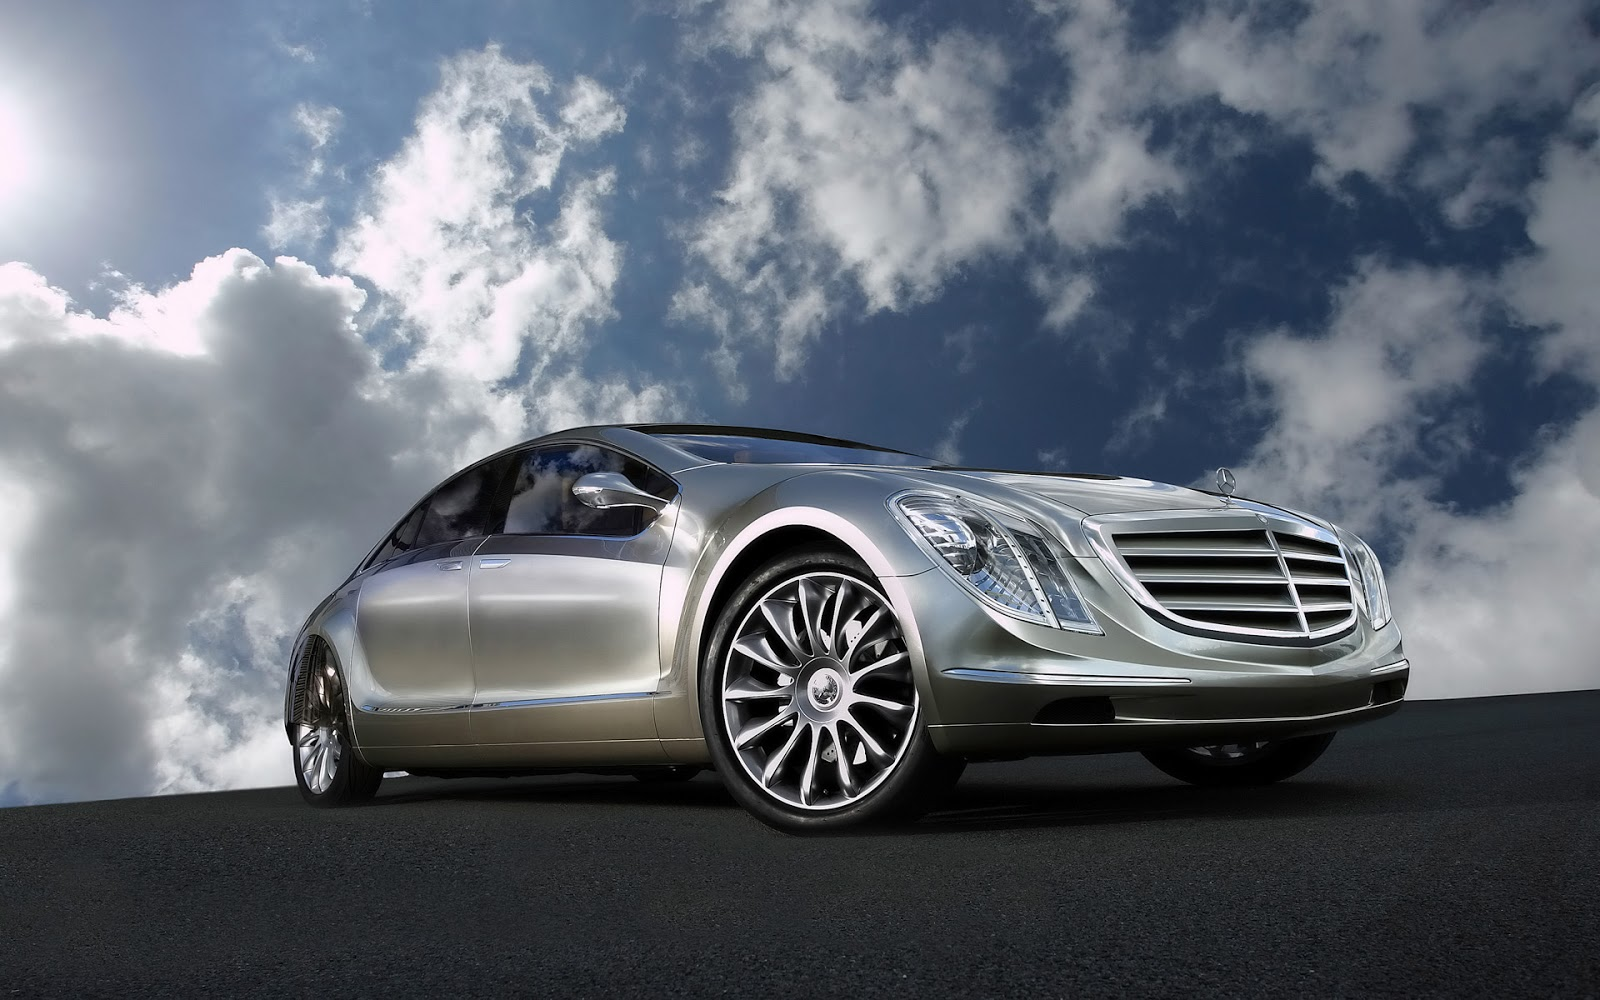 Wallpaper Name Mercedes AMG Wallpaper HD Best Resolution 1280x720 HD 1600x1000